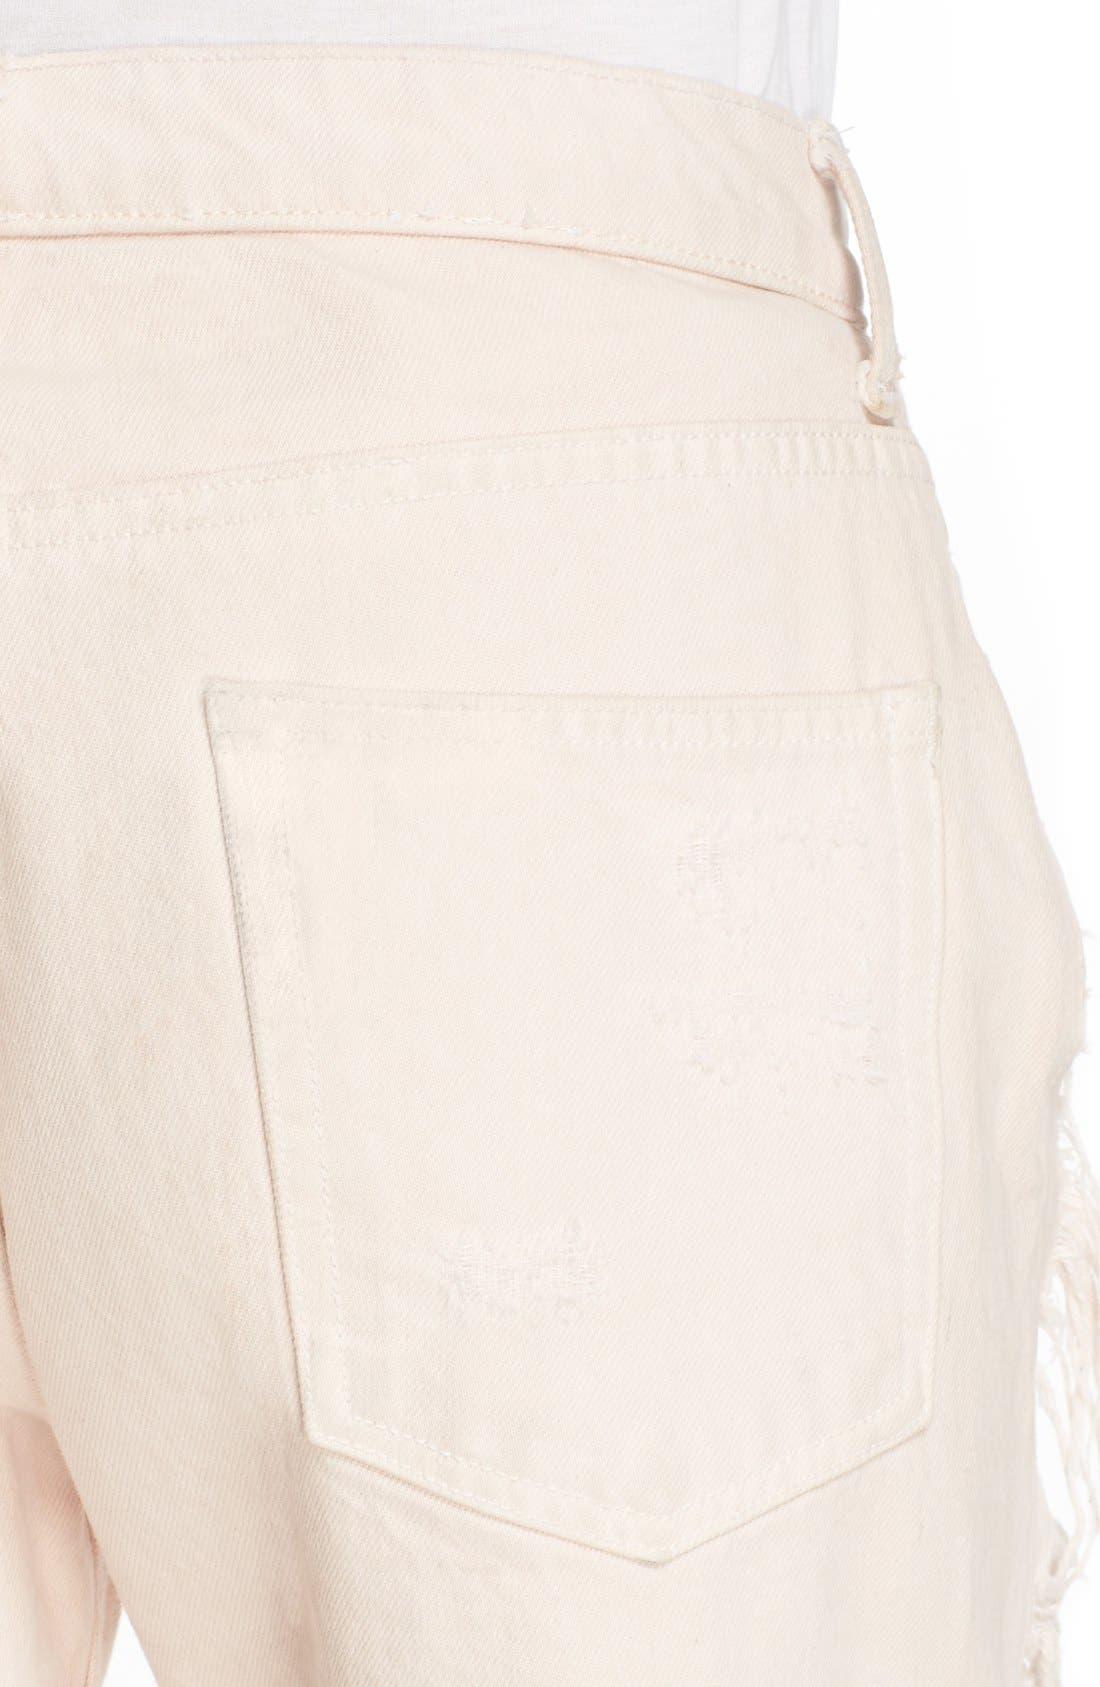 Alternate Image 5  - Alexander Wang 'Rival' Destroyed Cutoff Jeans (Carnation)